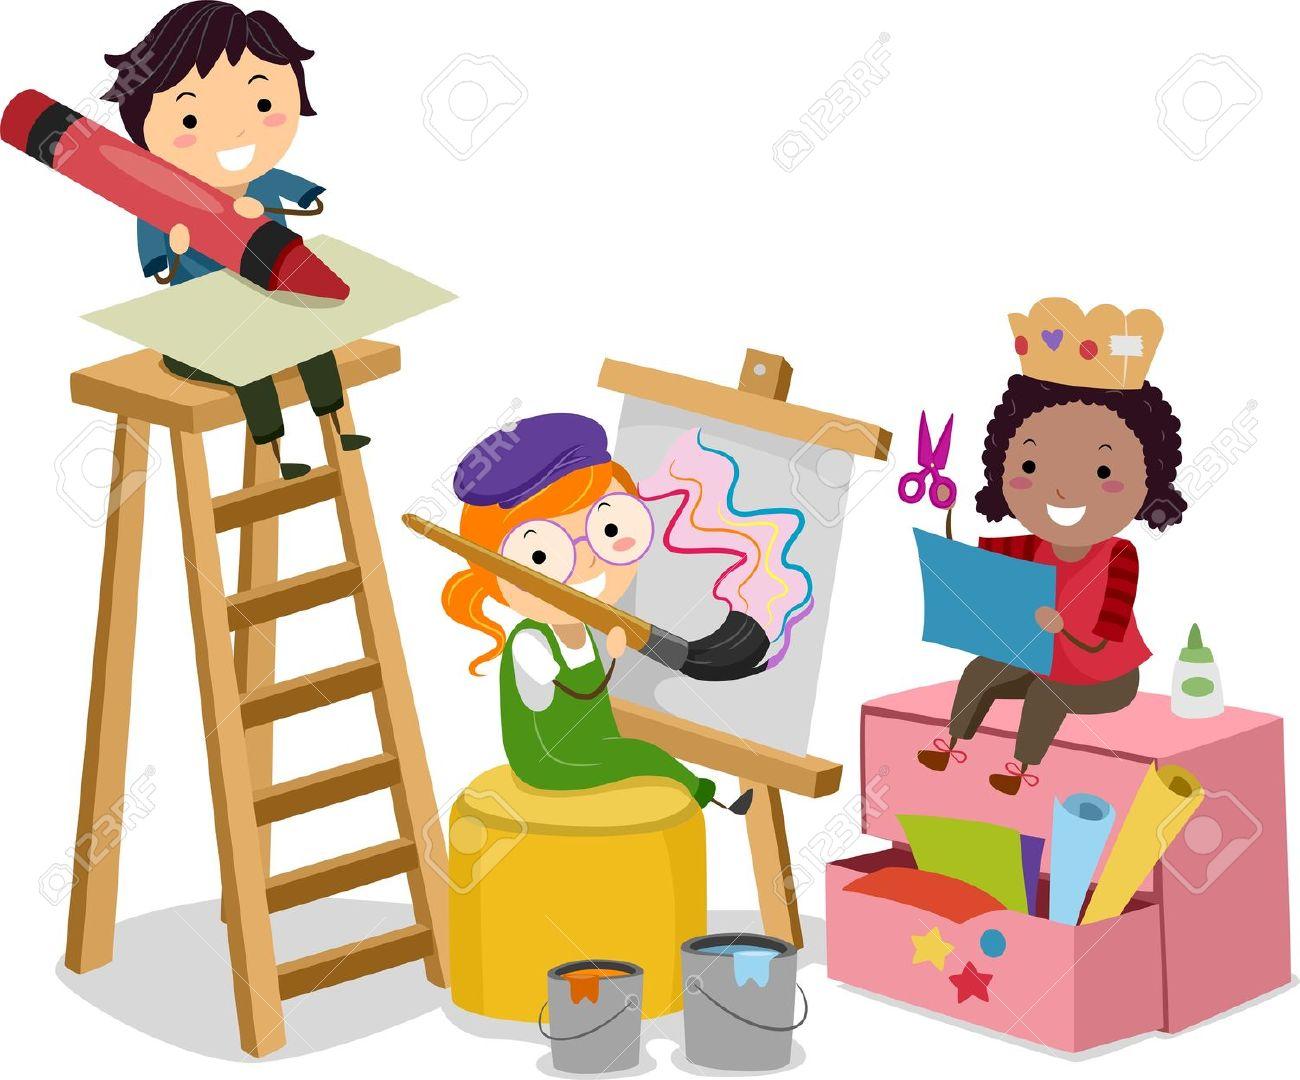 1300x1080 Illustration Of Stickman Kids Making Arts And Crafts Stock Photo